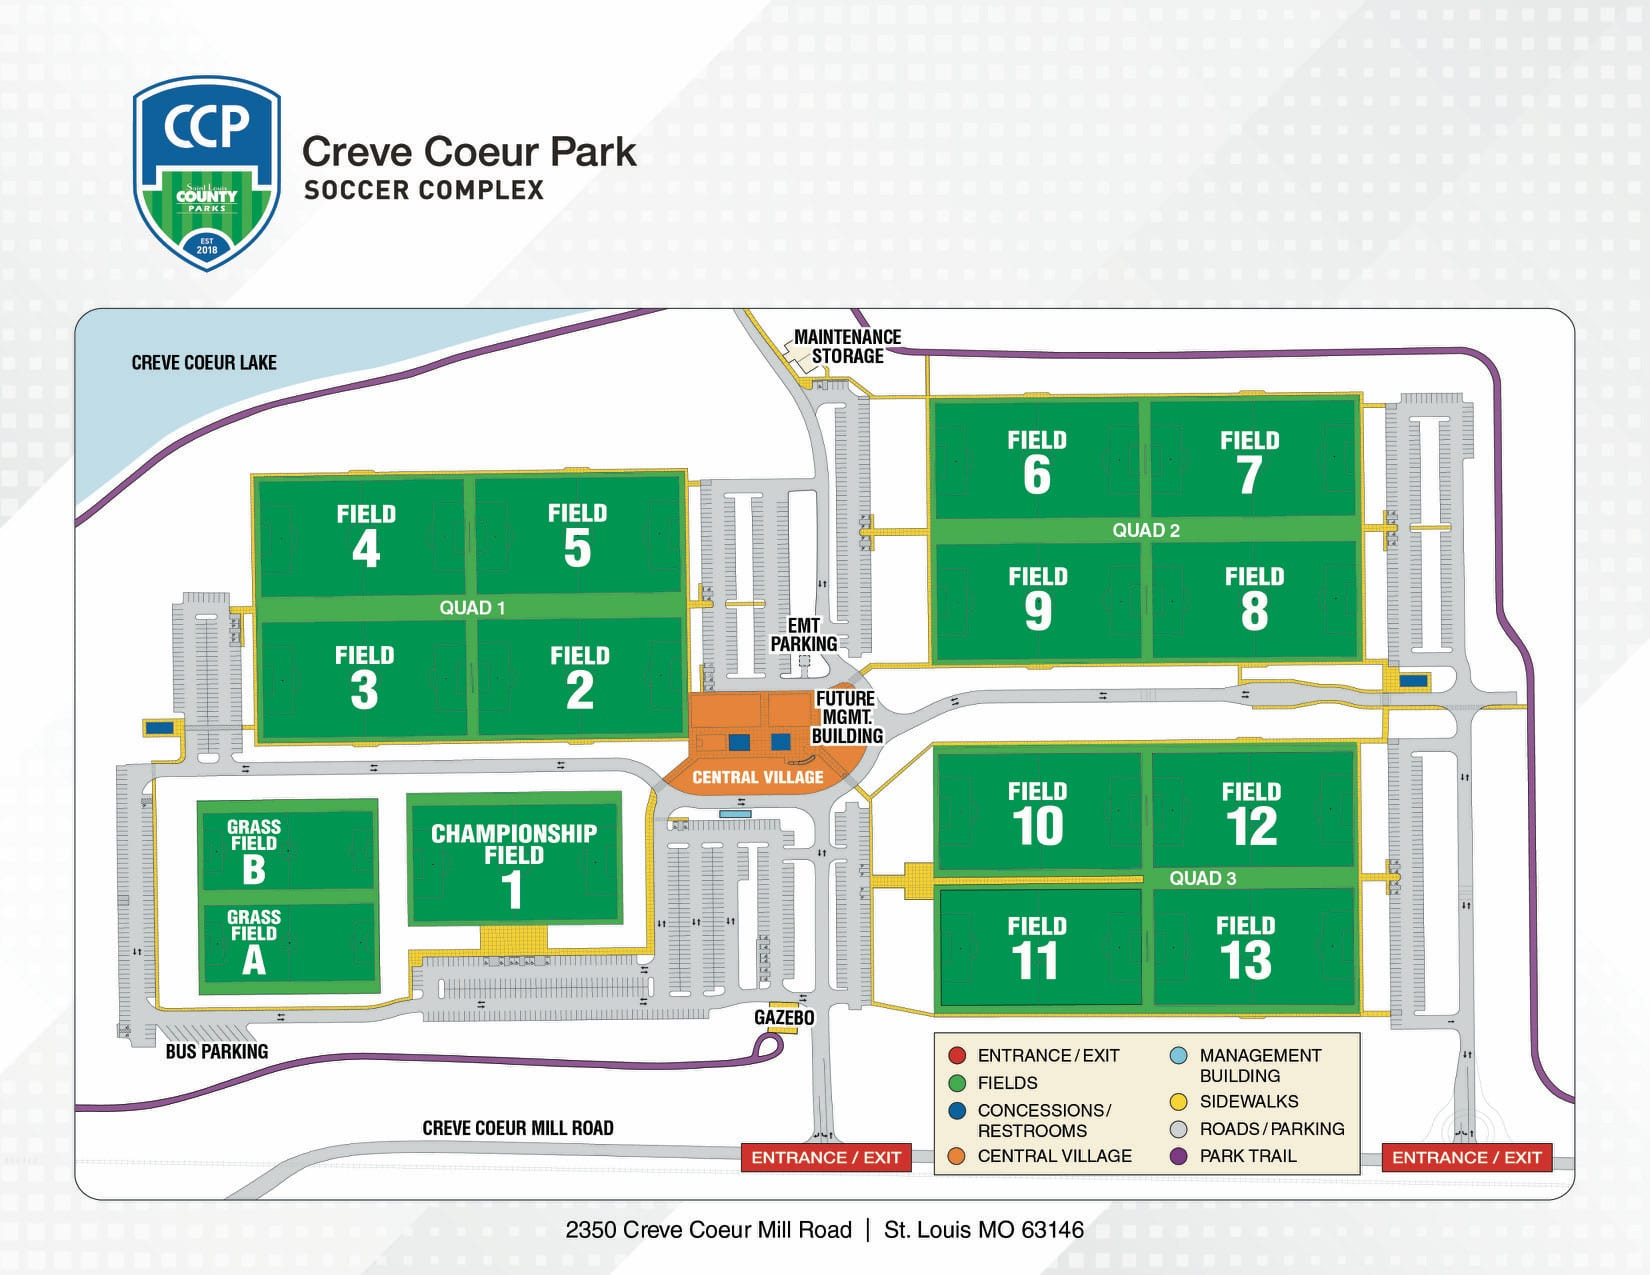 ccp_field_map